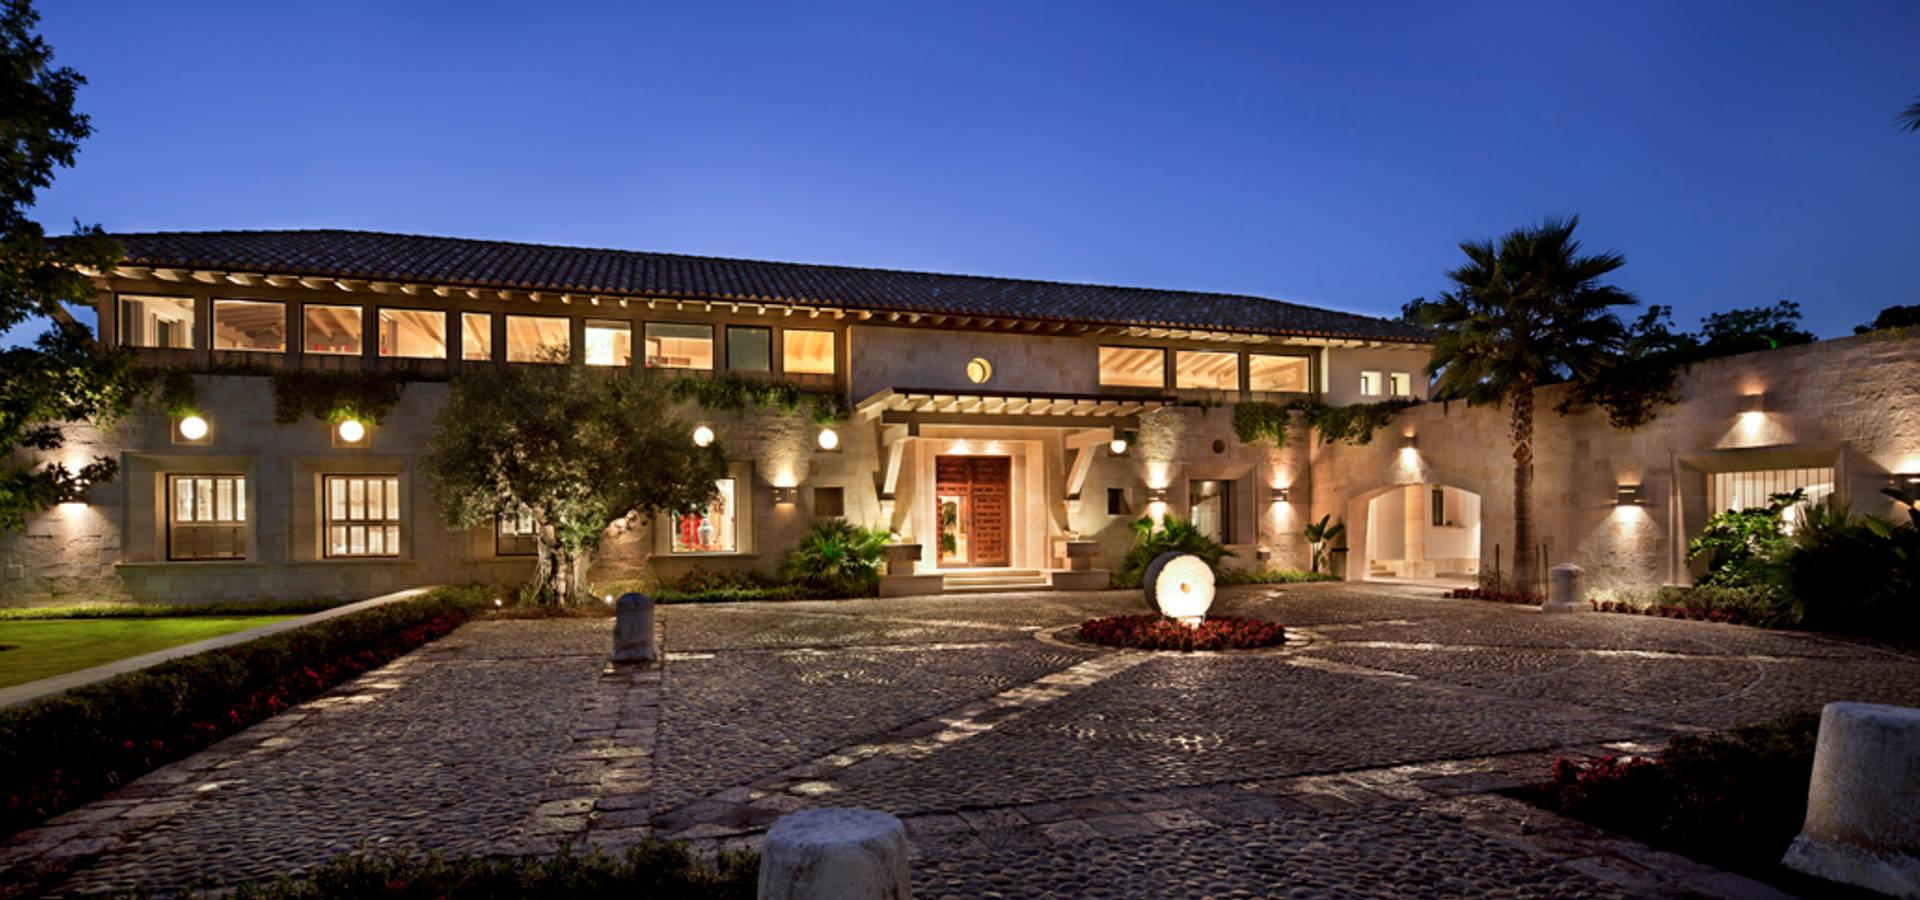 Casa artigas di artigas arquitectos homify for Case in stile hacienda